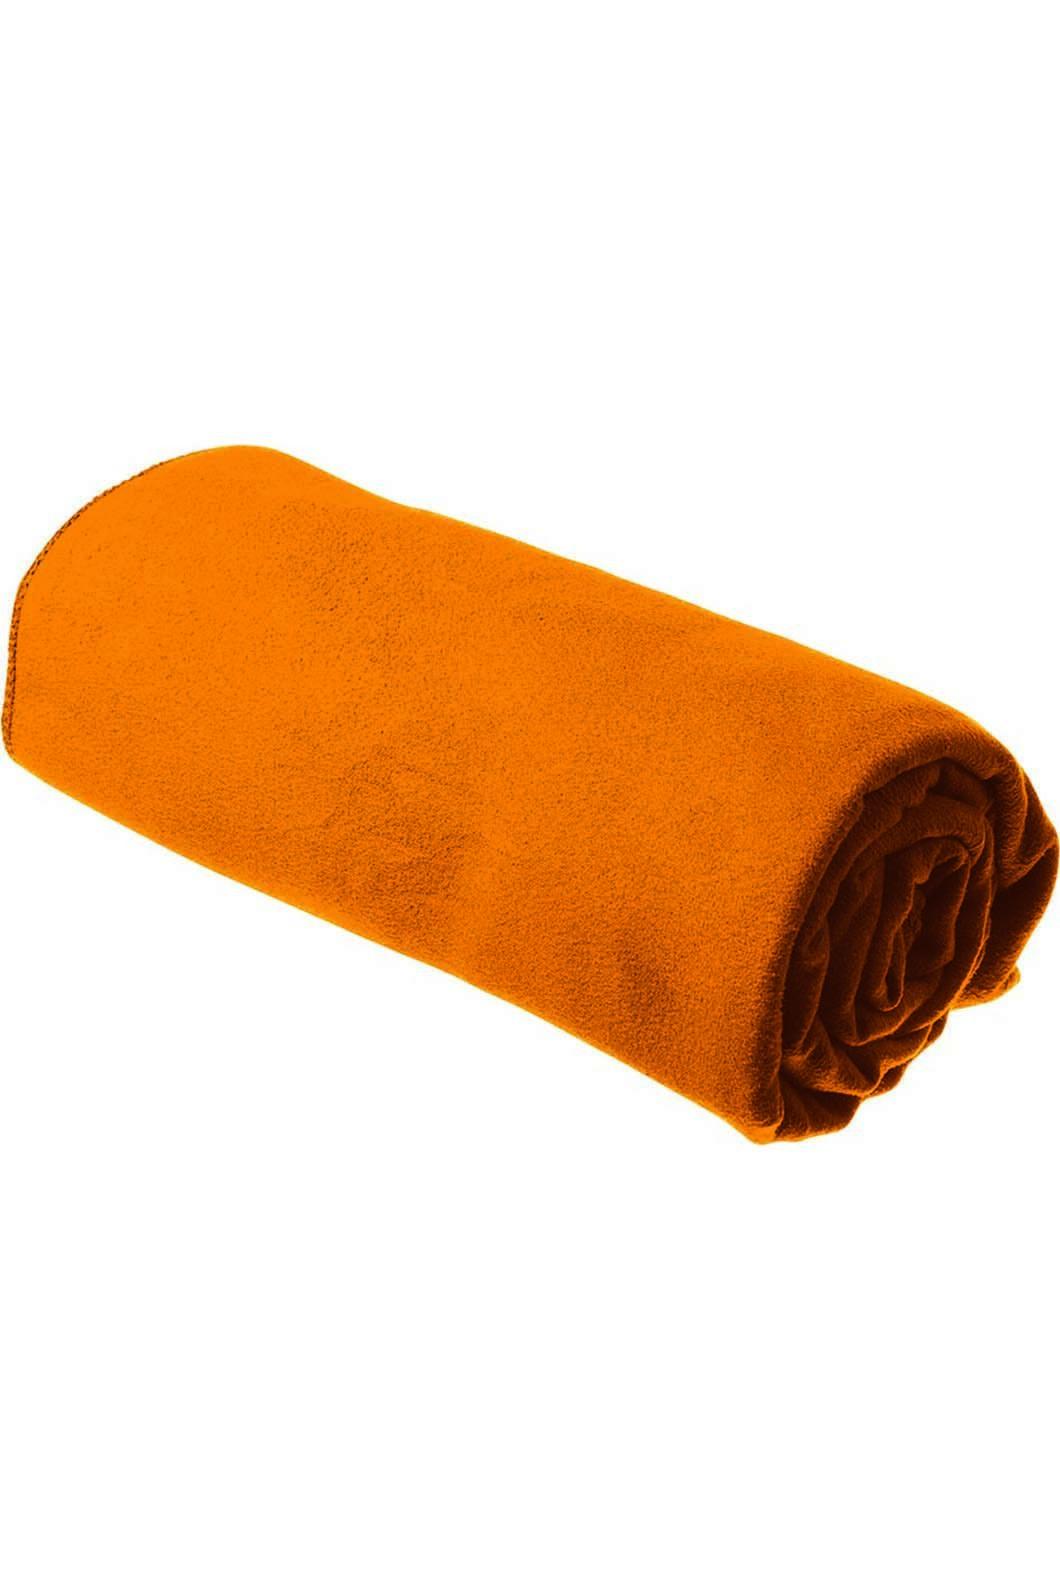 Sea to Summit Drylite Towel  M, None, hi-res